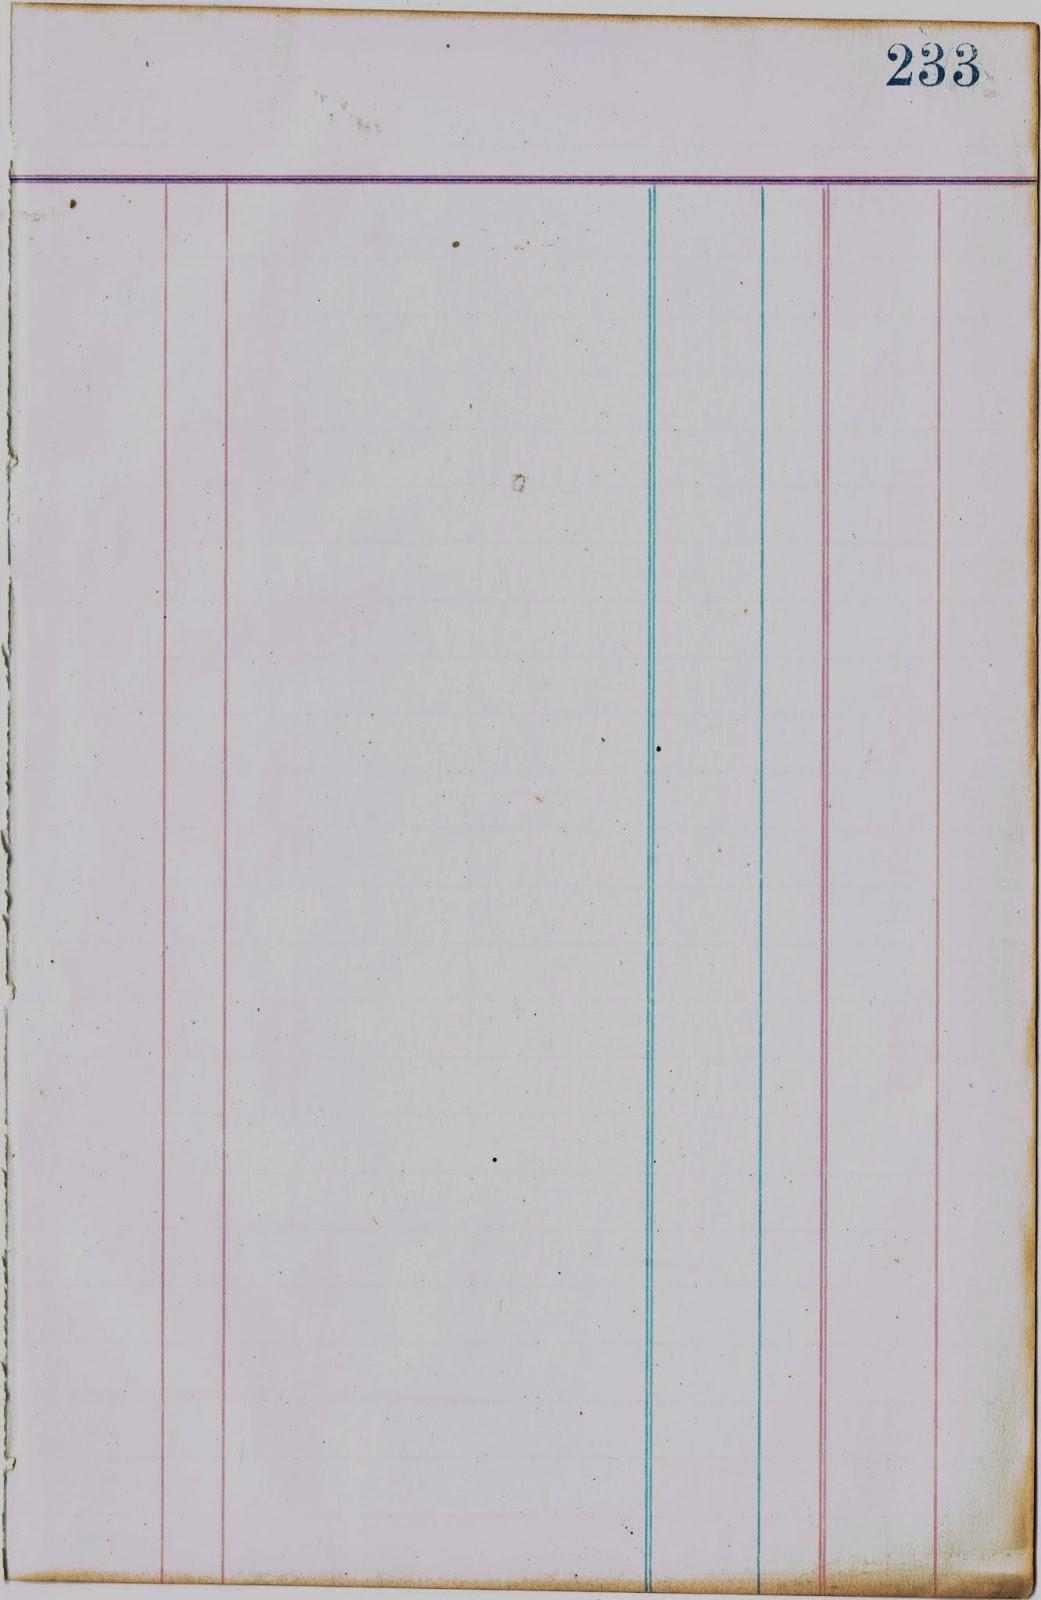 photo regarding Printable Ledger Page called 8 Blank Ledger Paper - Resume Illustrations Resume Template